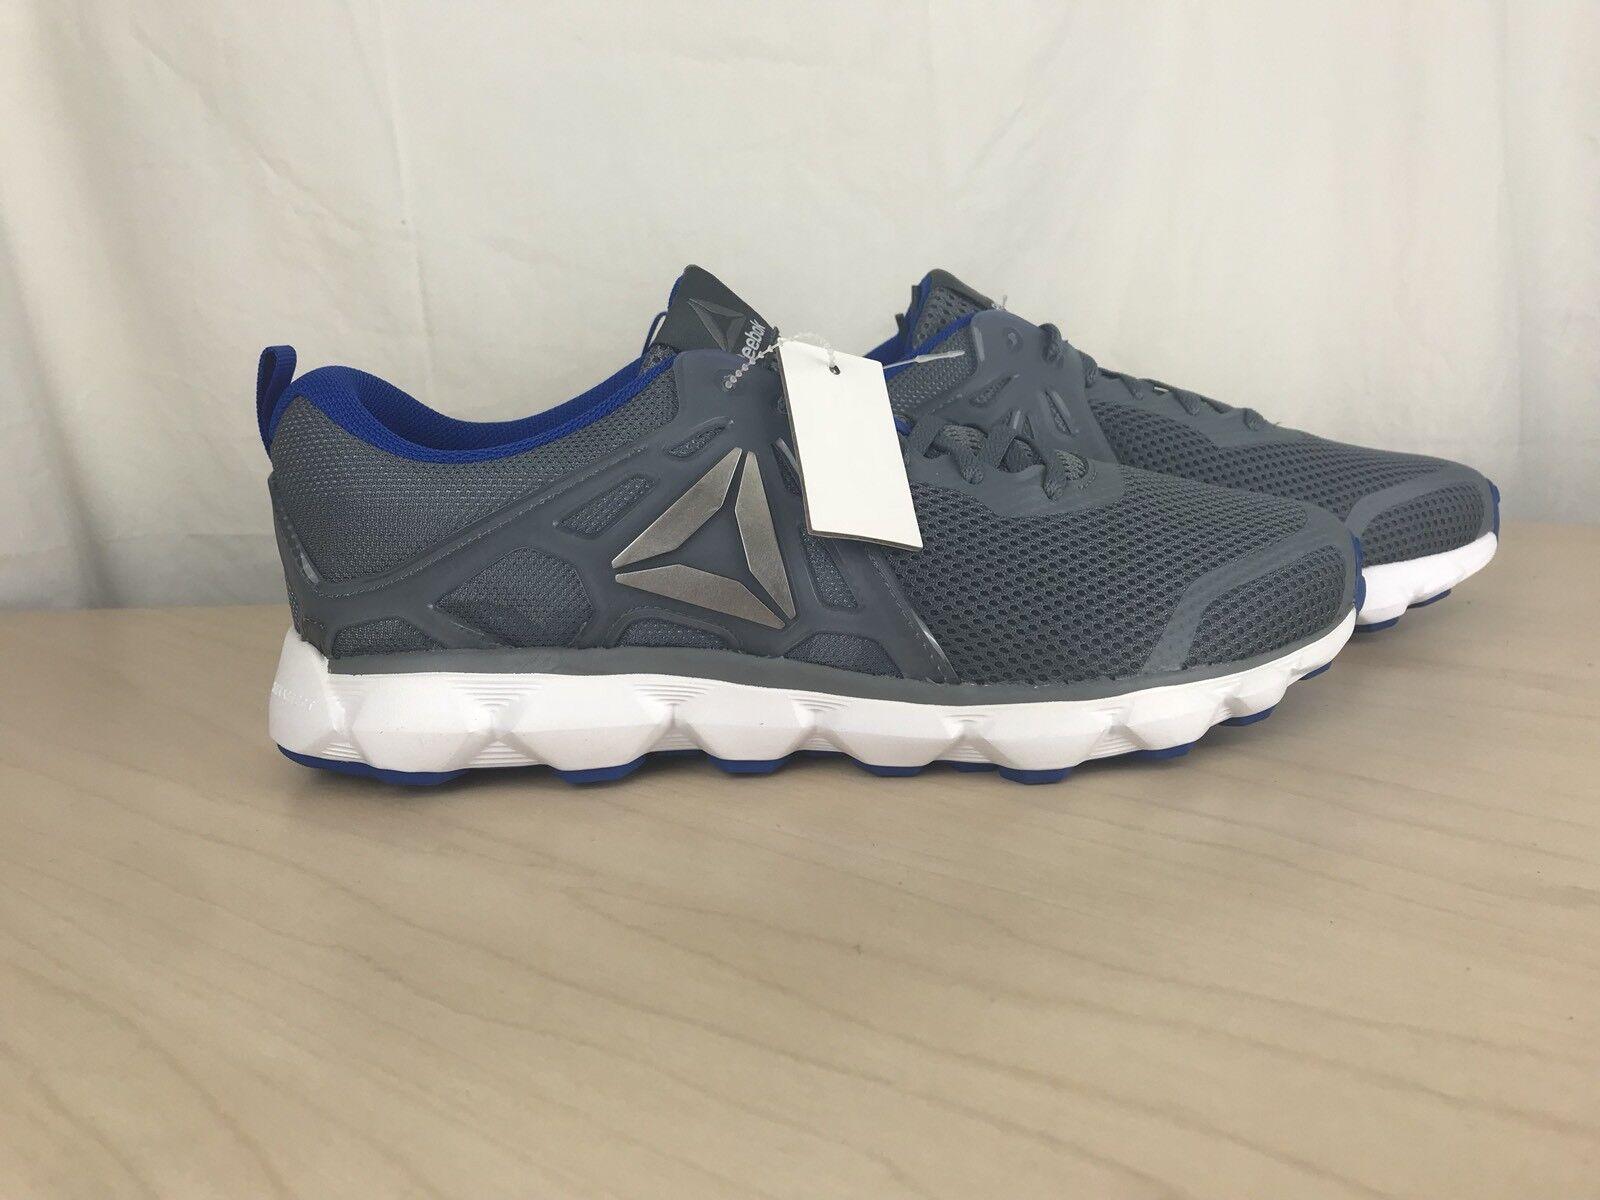 Reebok Hombre hexaffect / Run 5.0 MTM polvo / hexaffect azul / blanco / Alloy 6a2429